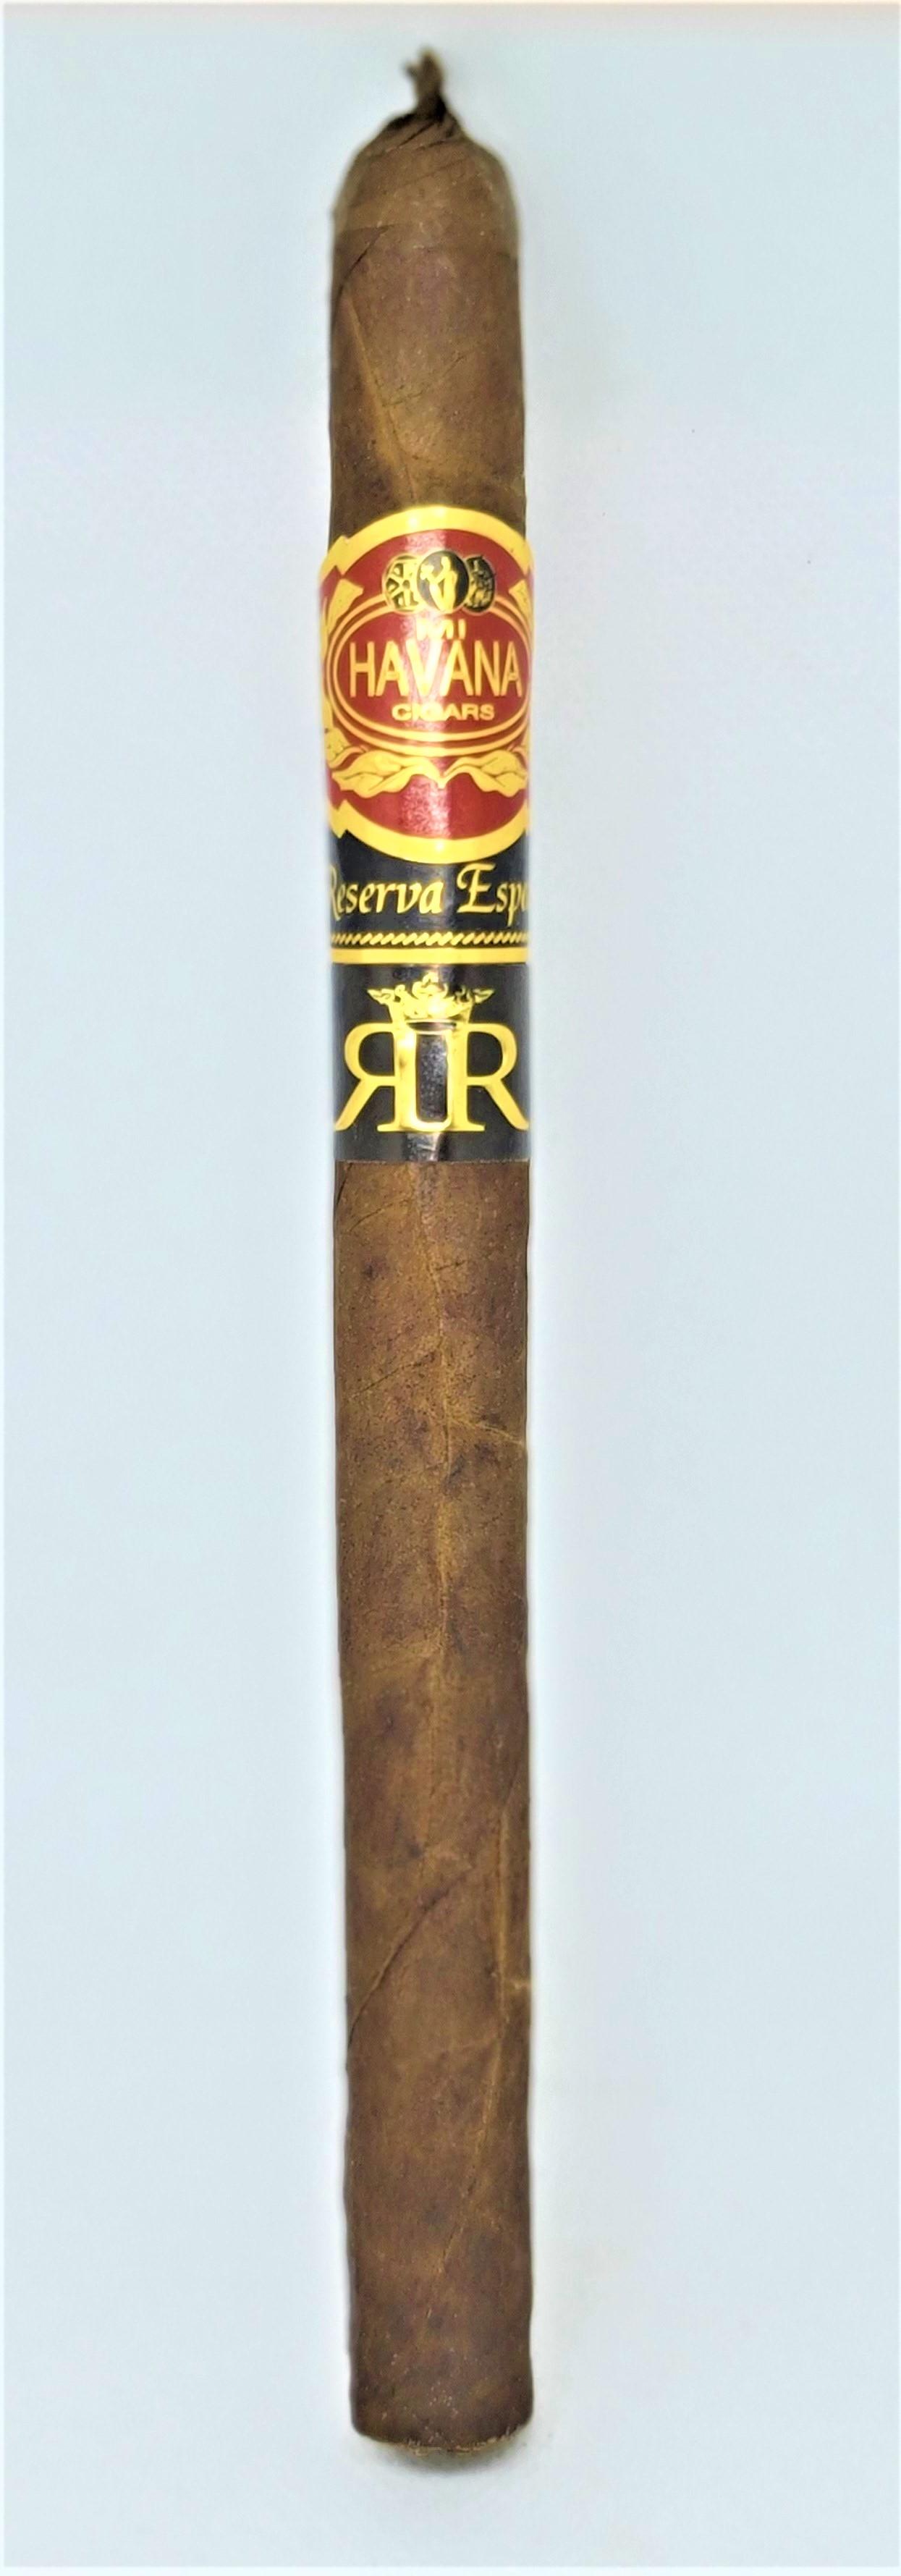 R&R Lancero Habano 40 x 7.5